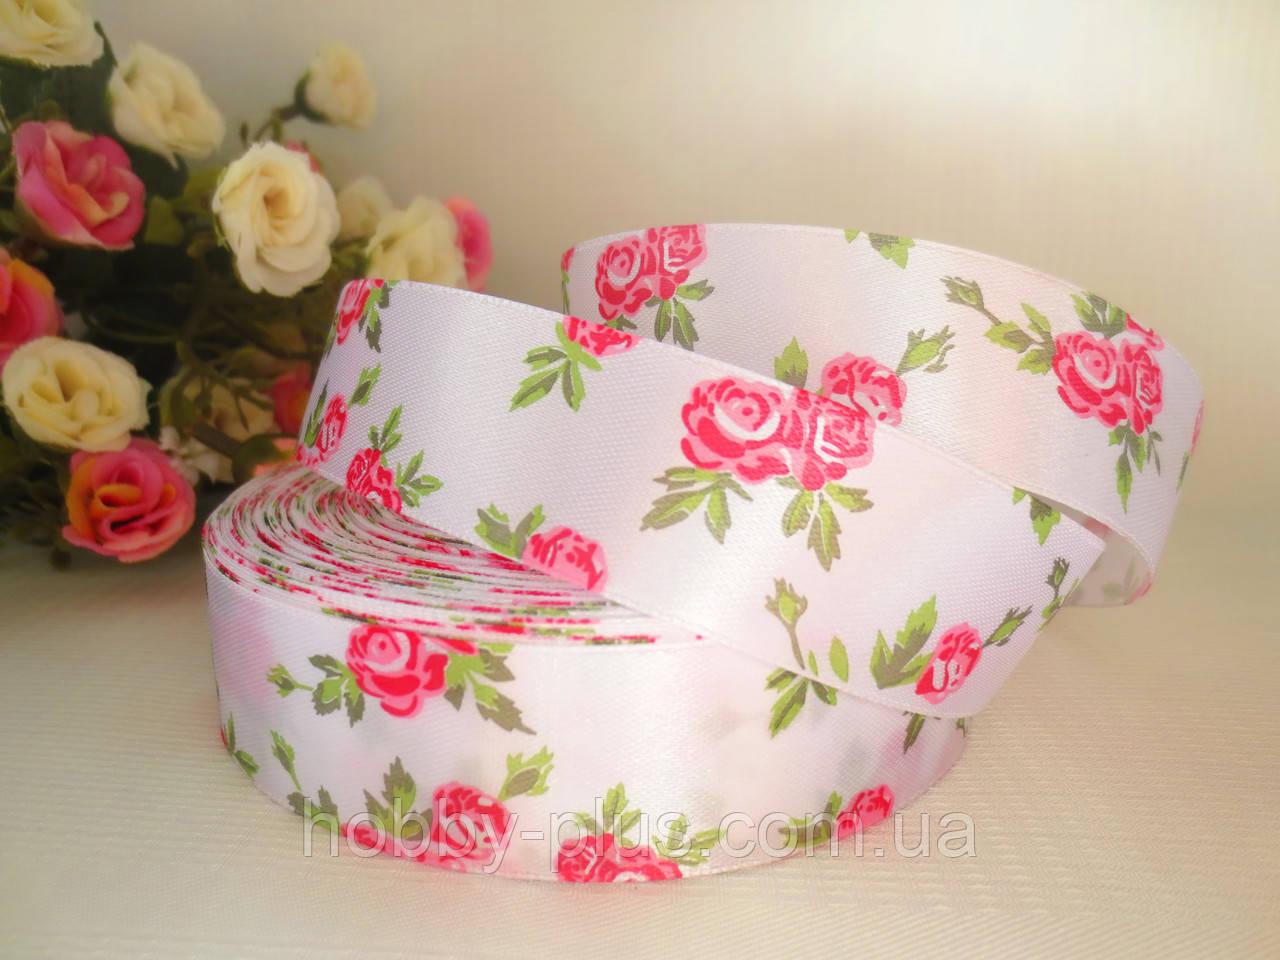 "Атласная лента 2,5 см, ""Розочка"", белая с розовыми розами"